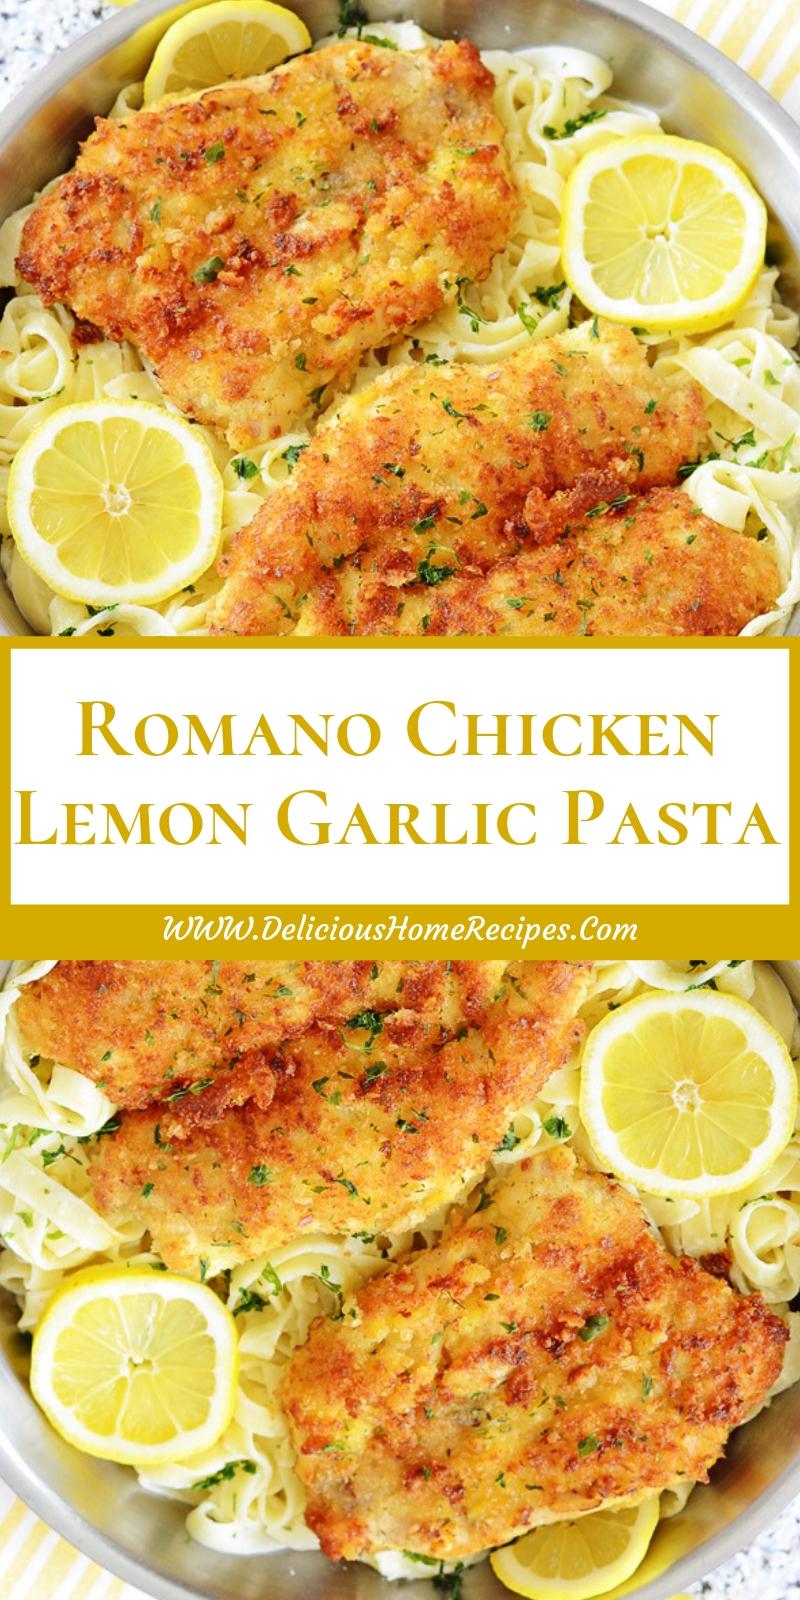 Romano Chicken Lemon Garlic Pasta